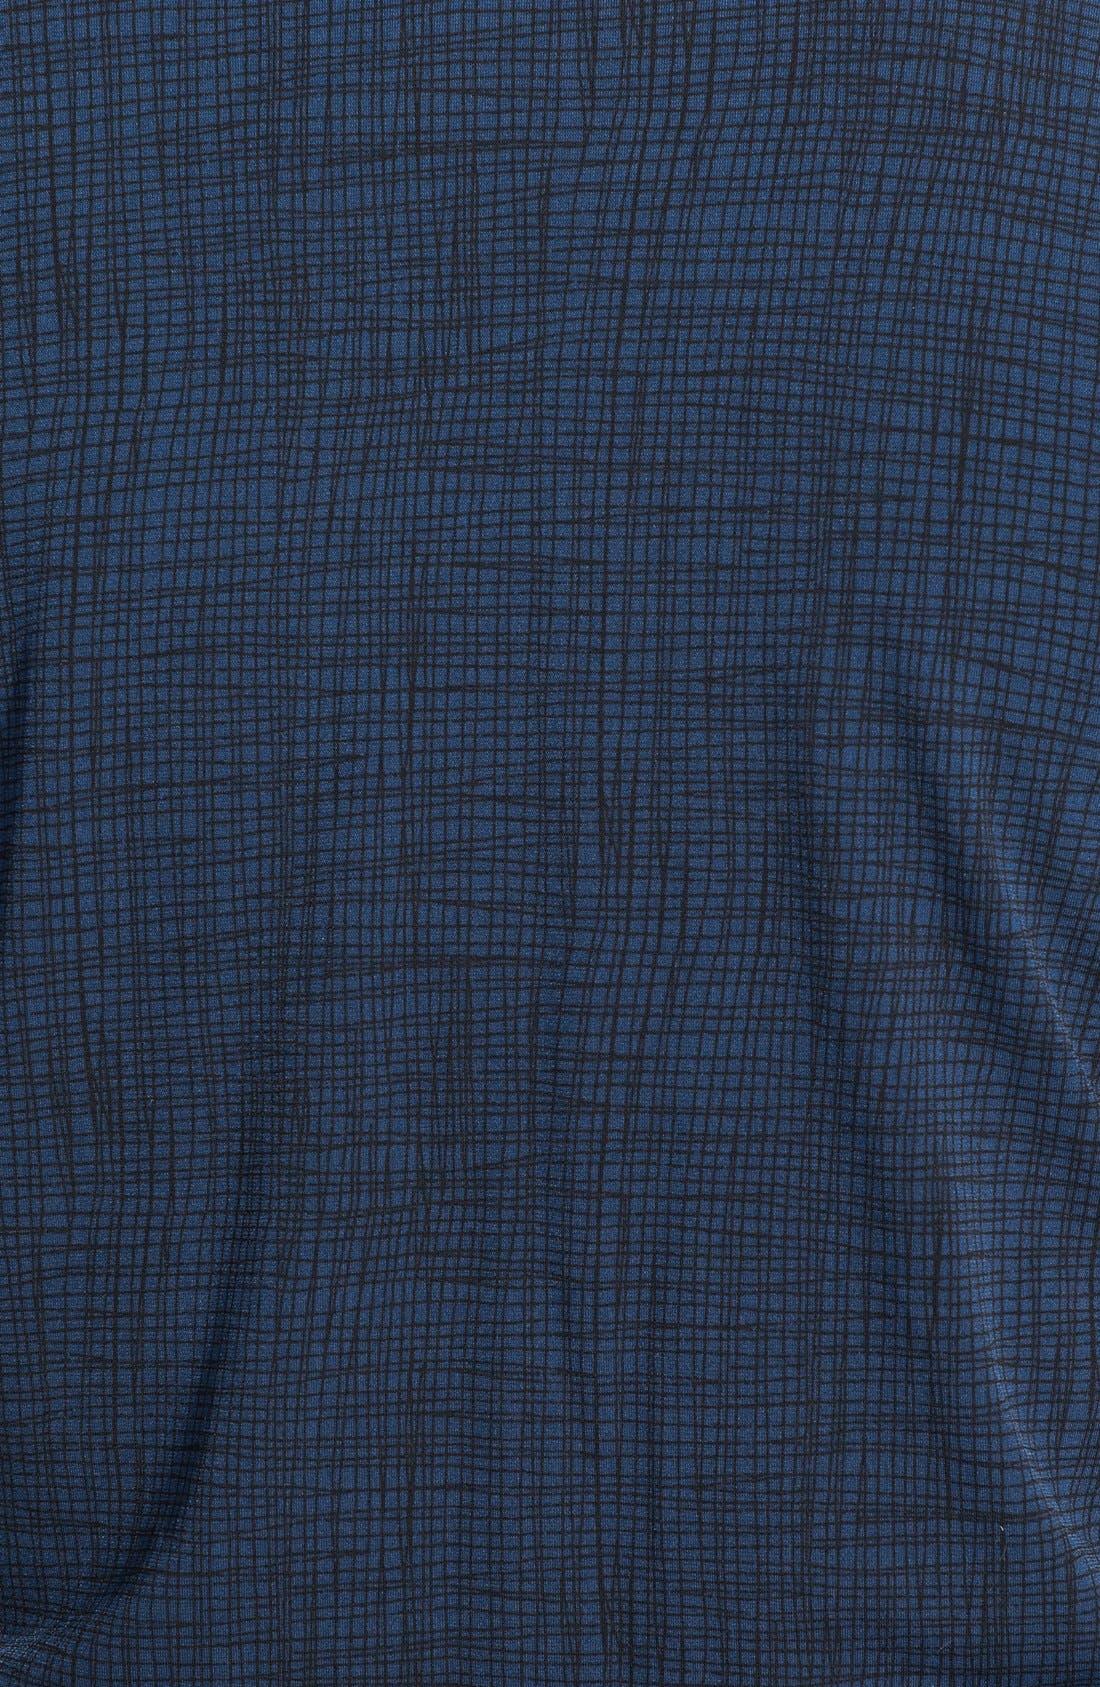 Alternate Image 3  - Vince Camuto Crosshatch Print V-Neck Top (Plus Size)